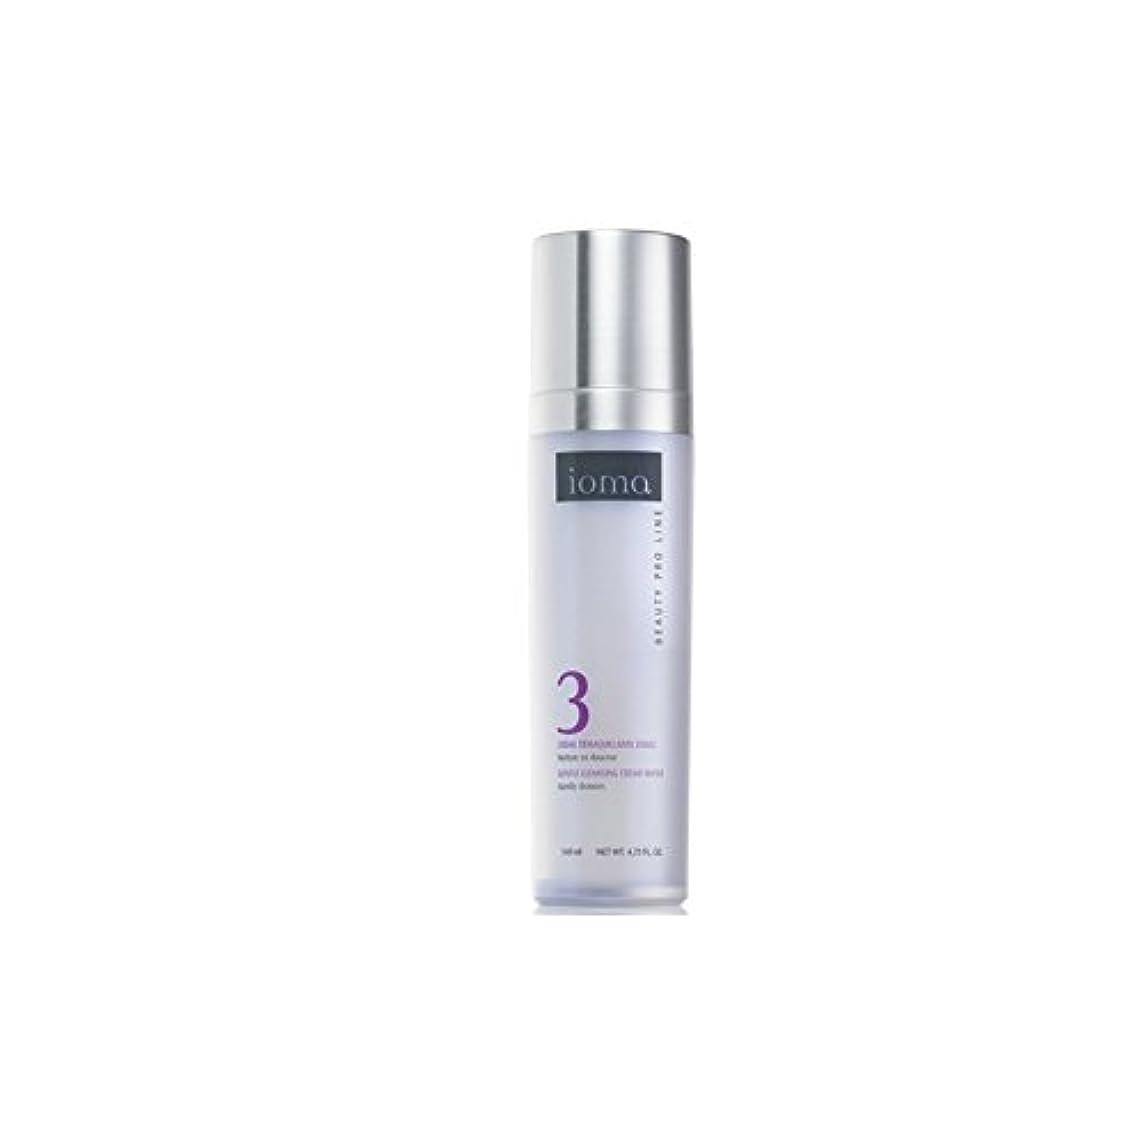 Ioma Gentle Cleansing Cream Water 140ml (Pack of 6) - ジェントルクレンジングクリーム水140ミリリットル x6 [並行輸入品]